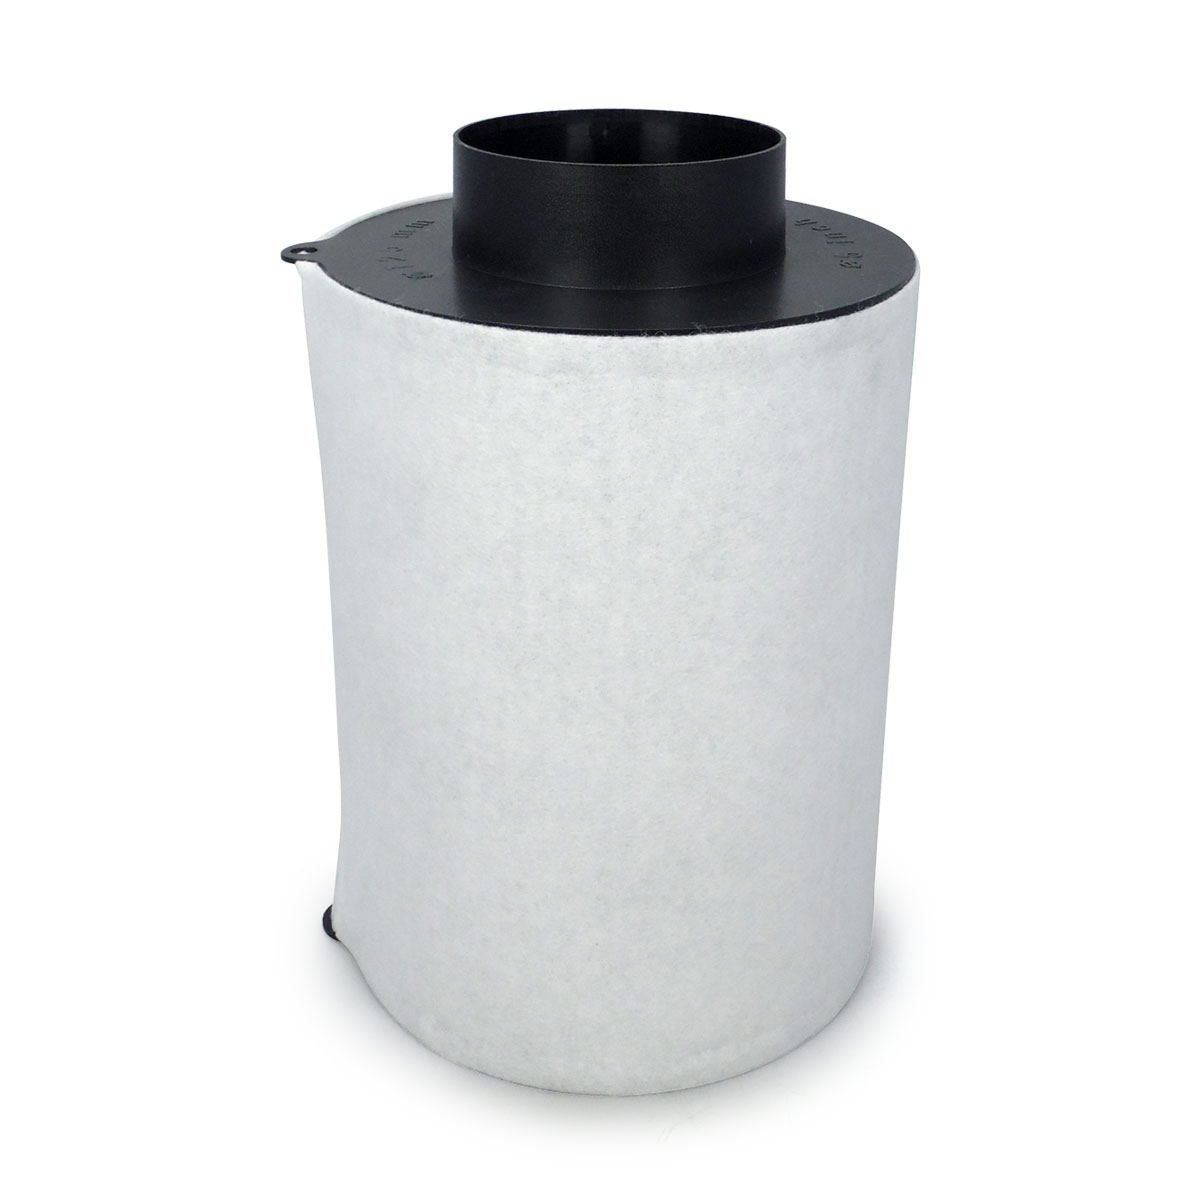 filtre de ventilation anti odeur proactiv carbon filter 690m3 h max sortie 150mm hydrozone. Black Bedroom Furniture Sets. Home Design Ideas